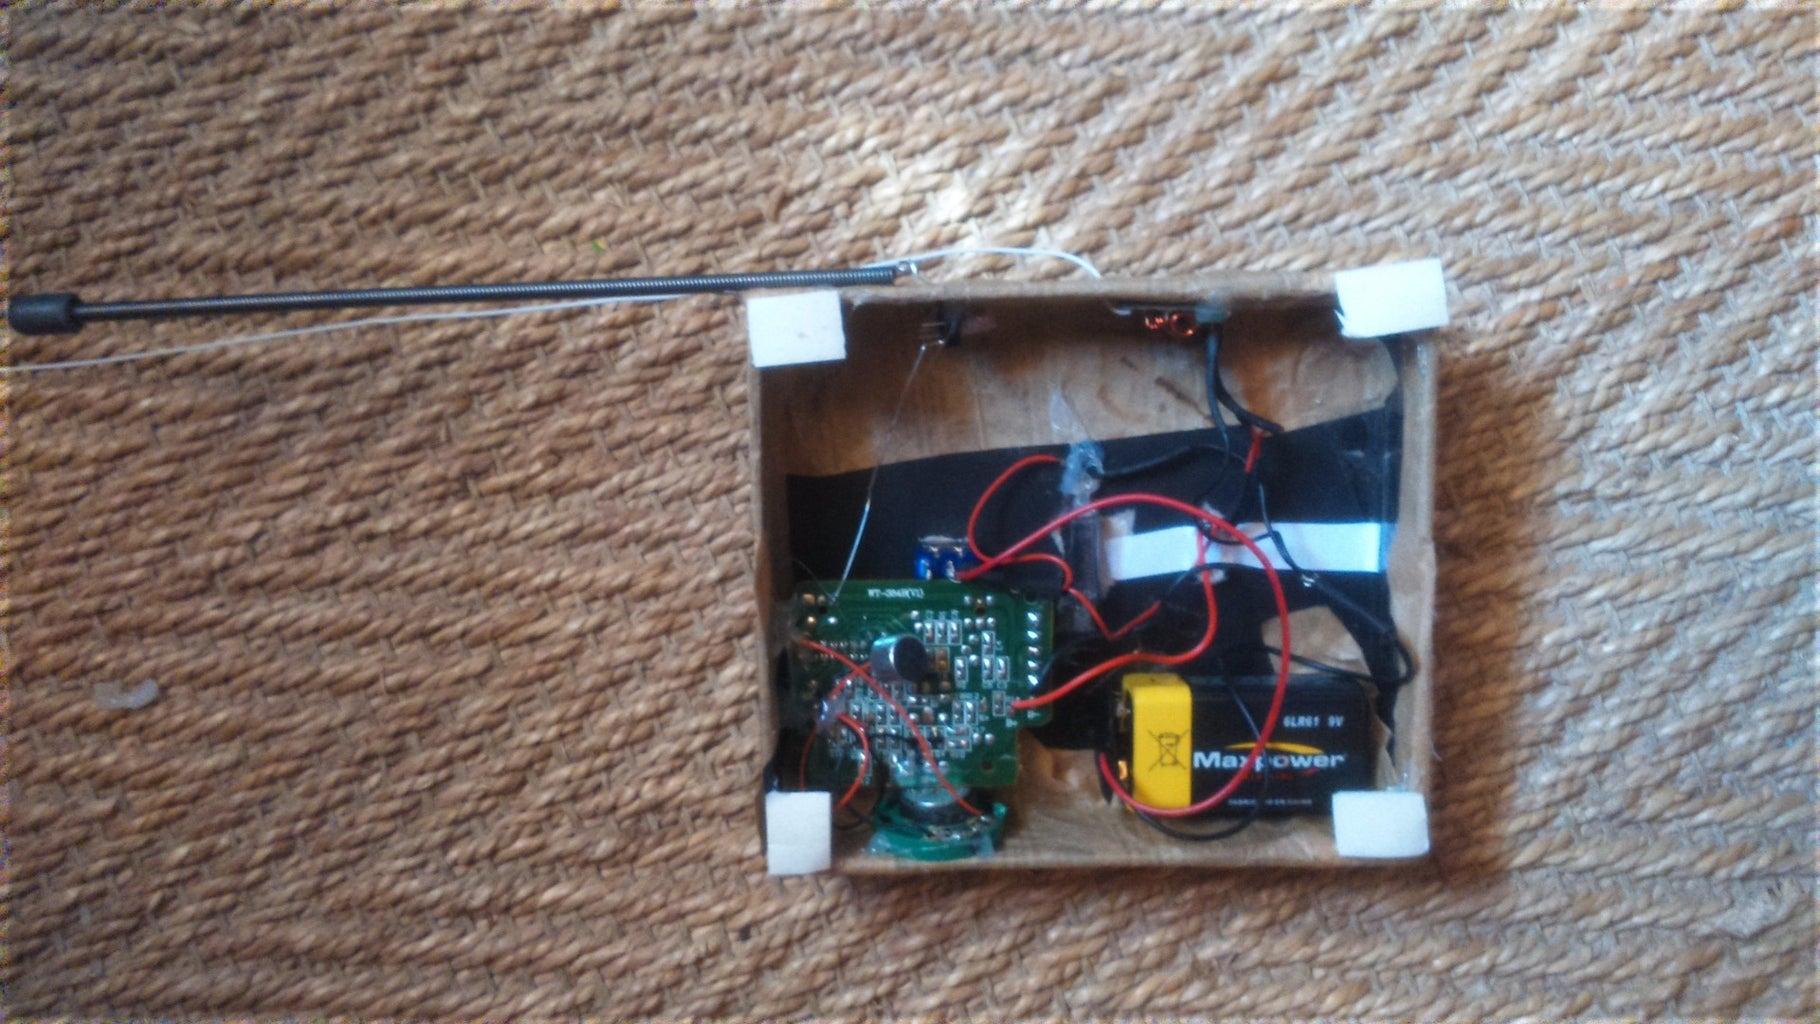 The Transmitter Panel